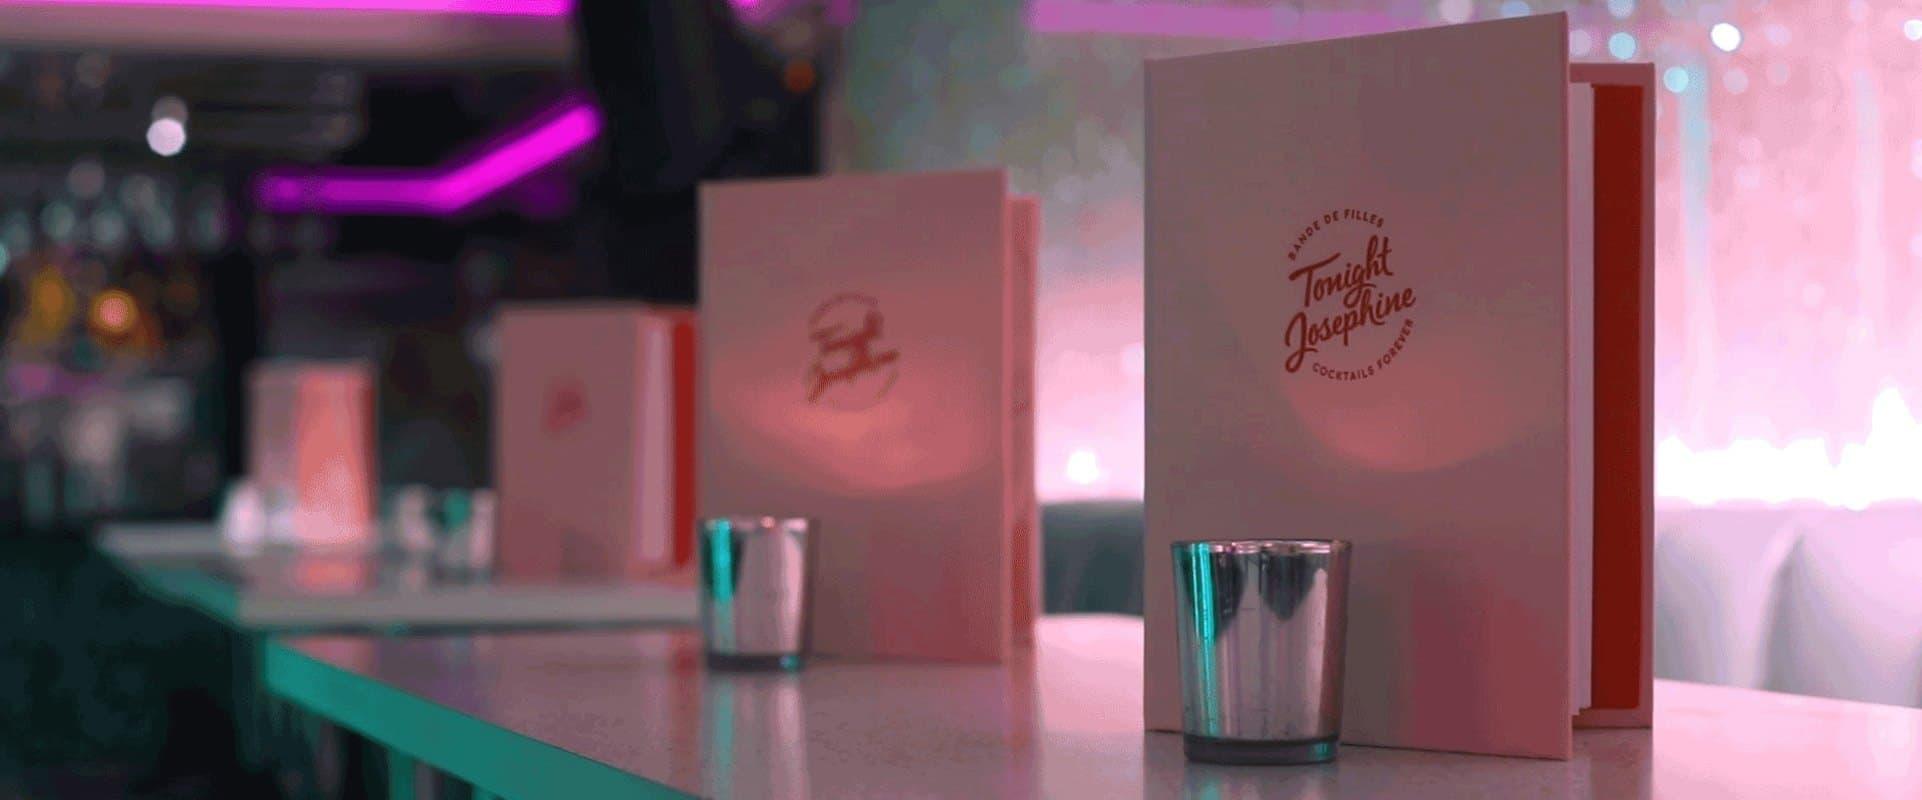 Cocktail O'Clock: Tonight Josephine, London